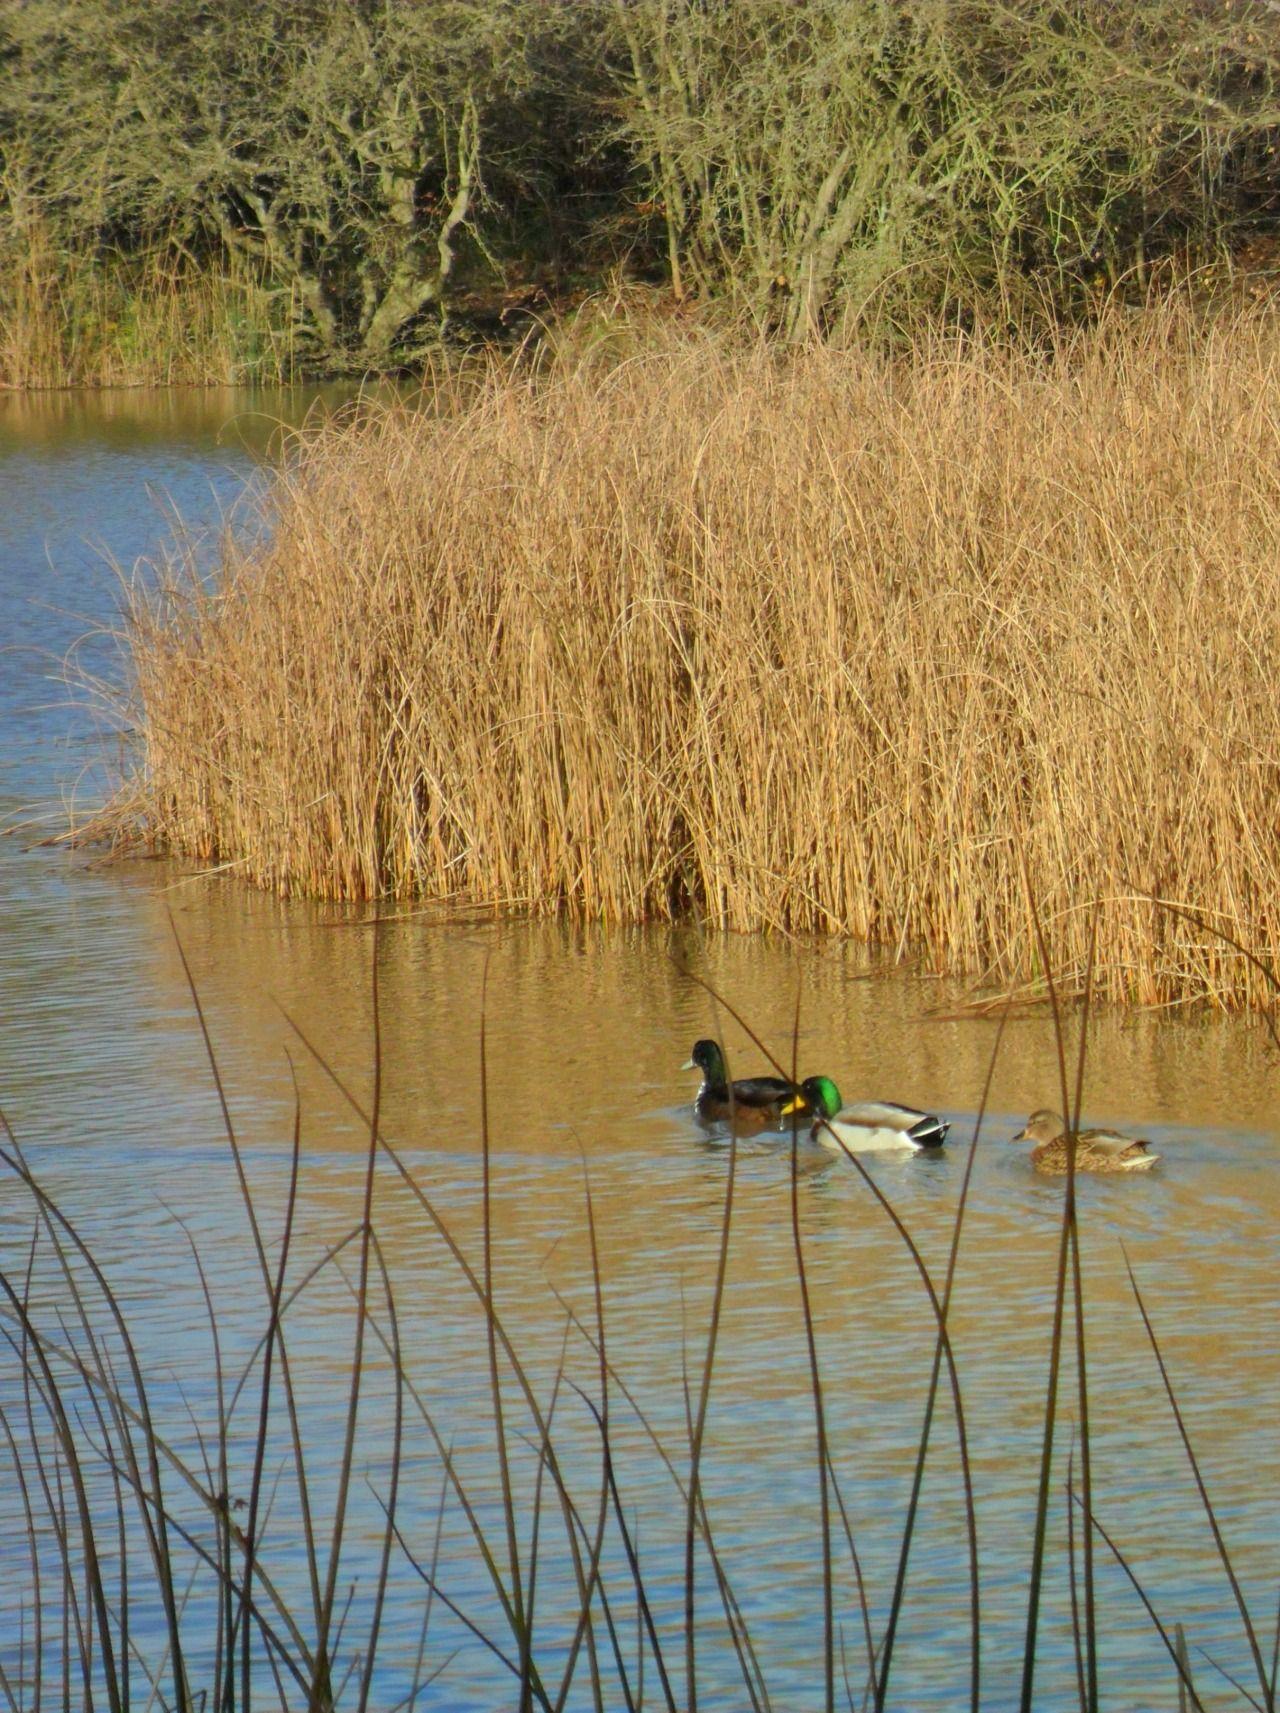 duckMallard Ducks at Park Lime Pits Lake, Aldridge, Walsall, England ...